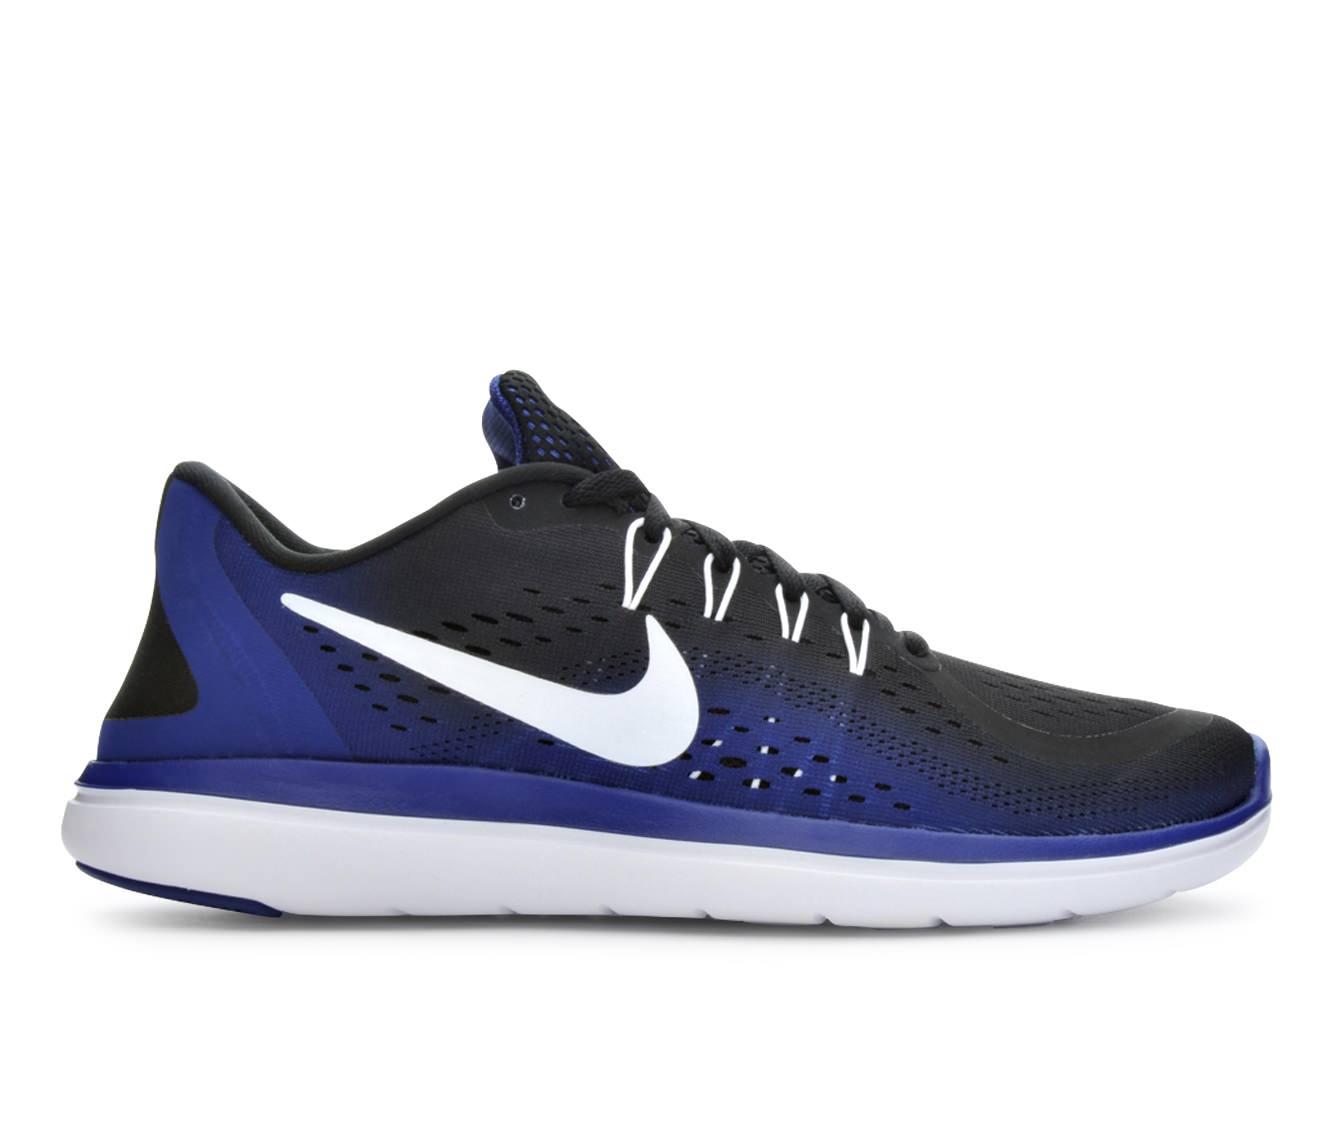 Men's Nike Flex 2017 Run Running Shoes (Black - Size 10.5) 1652043